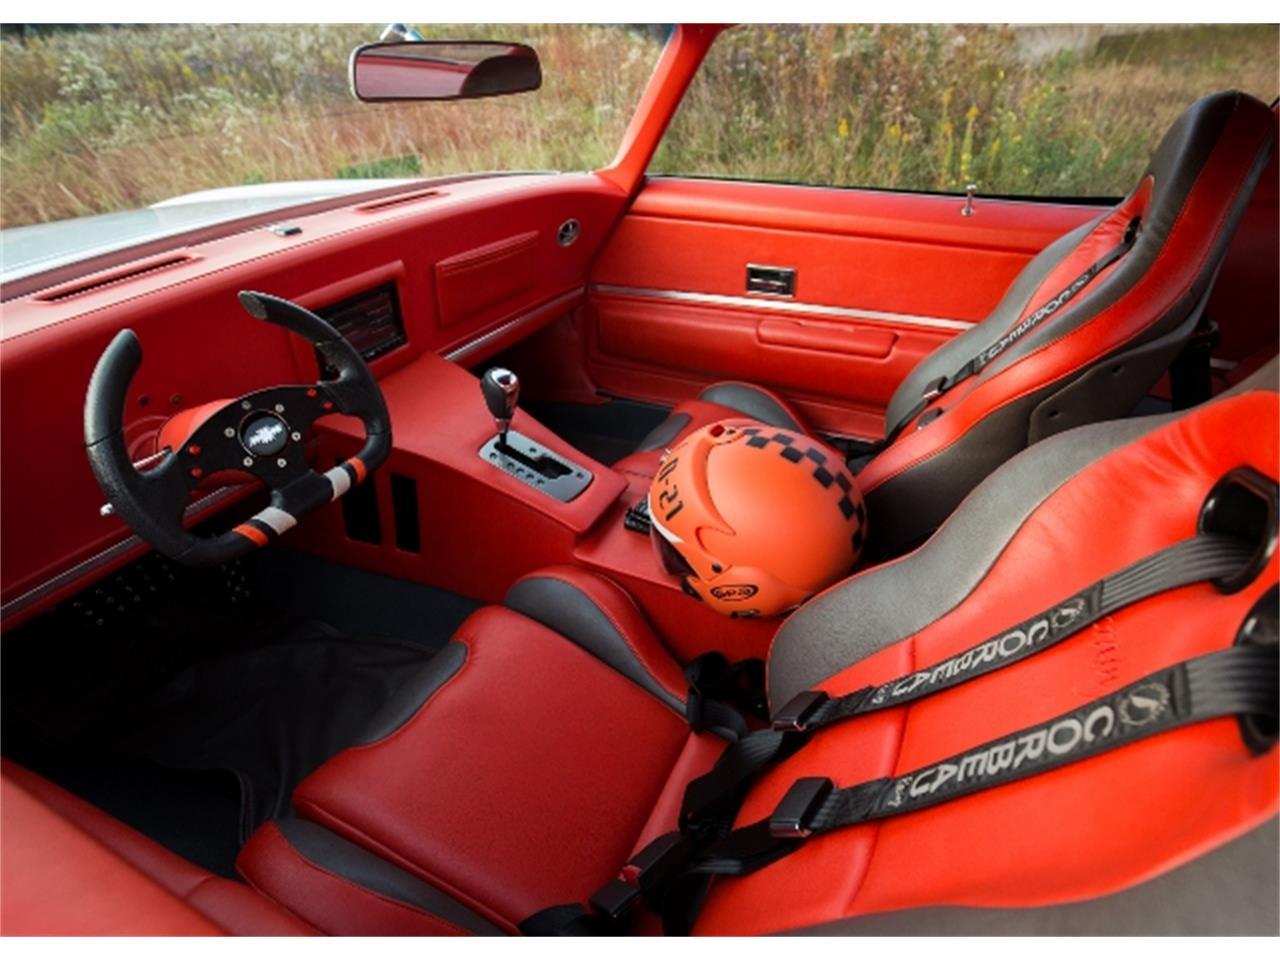 Large Picture of Classic '70 Camaro - $99,000.00 - GGNI